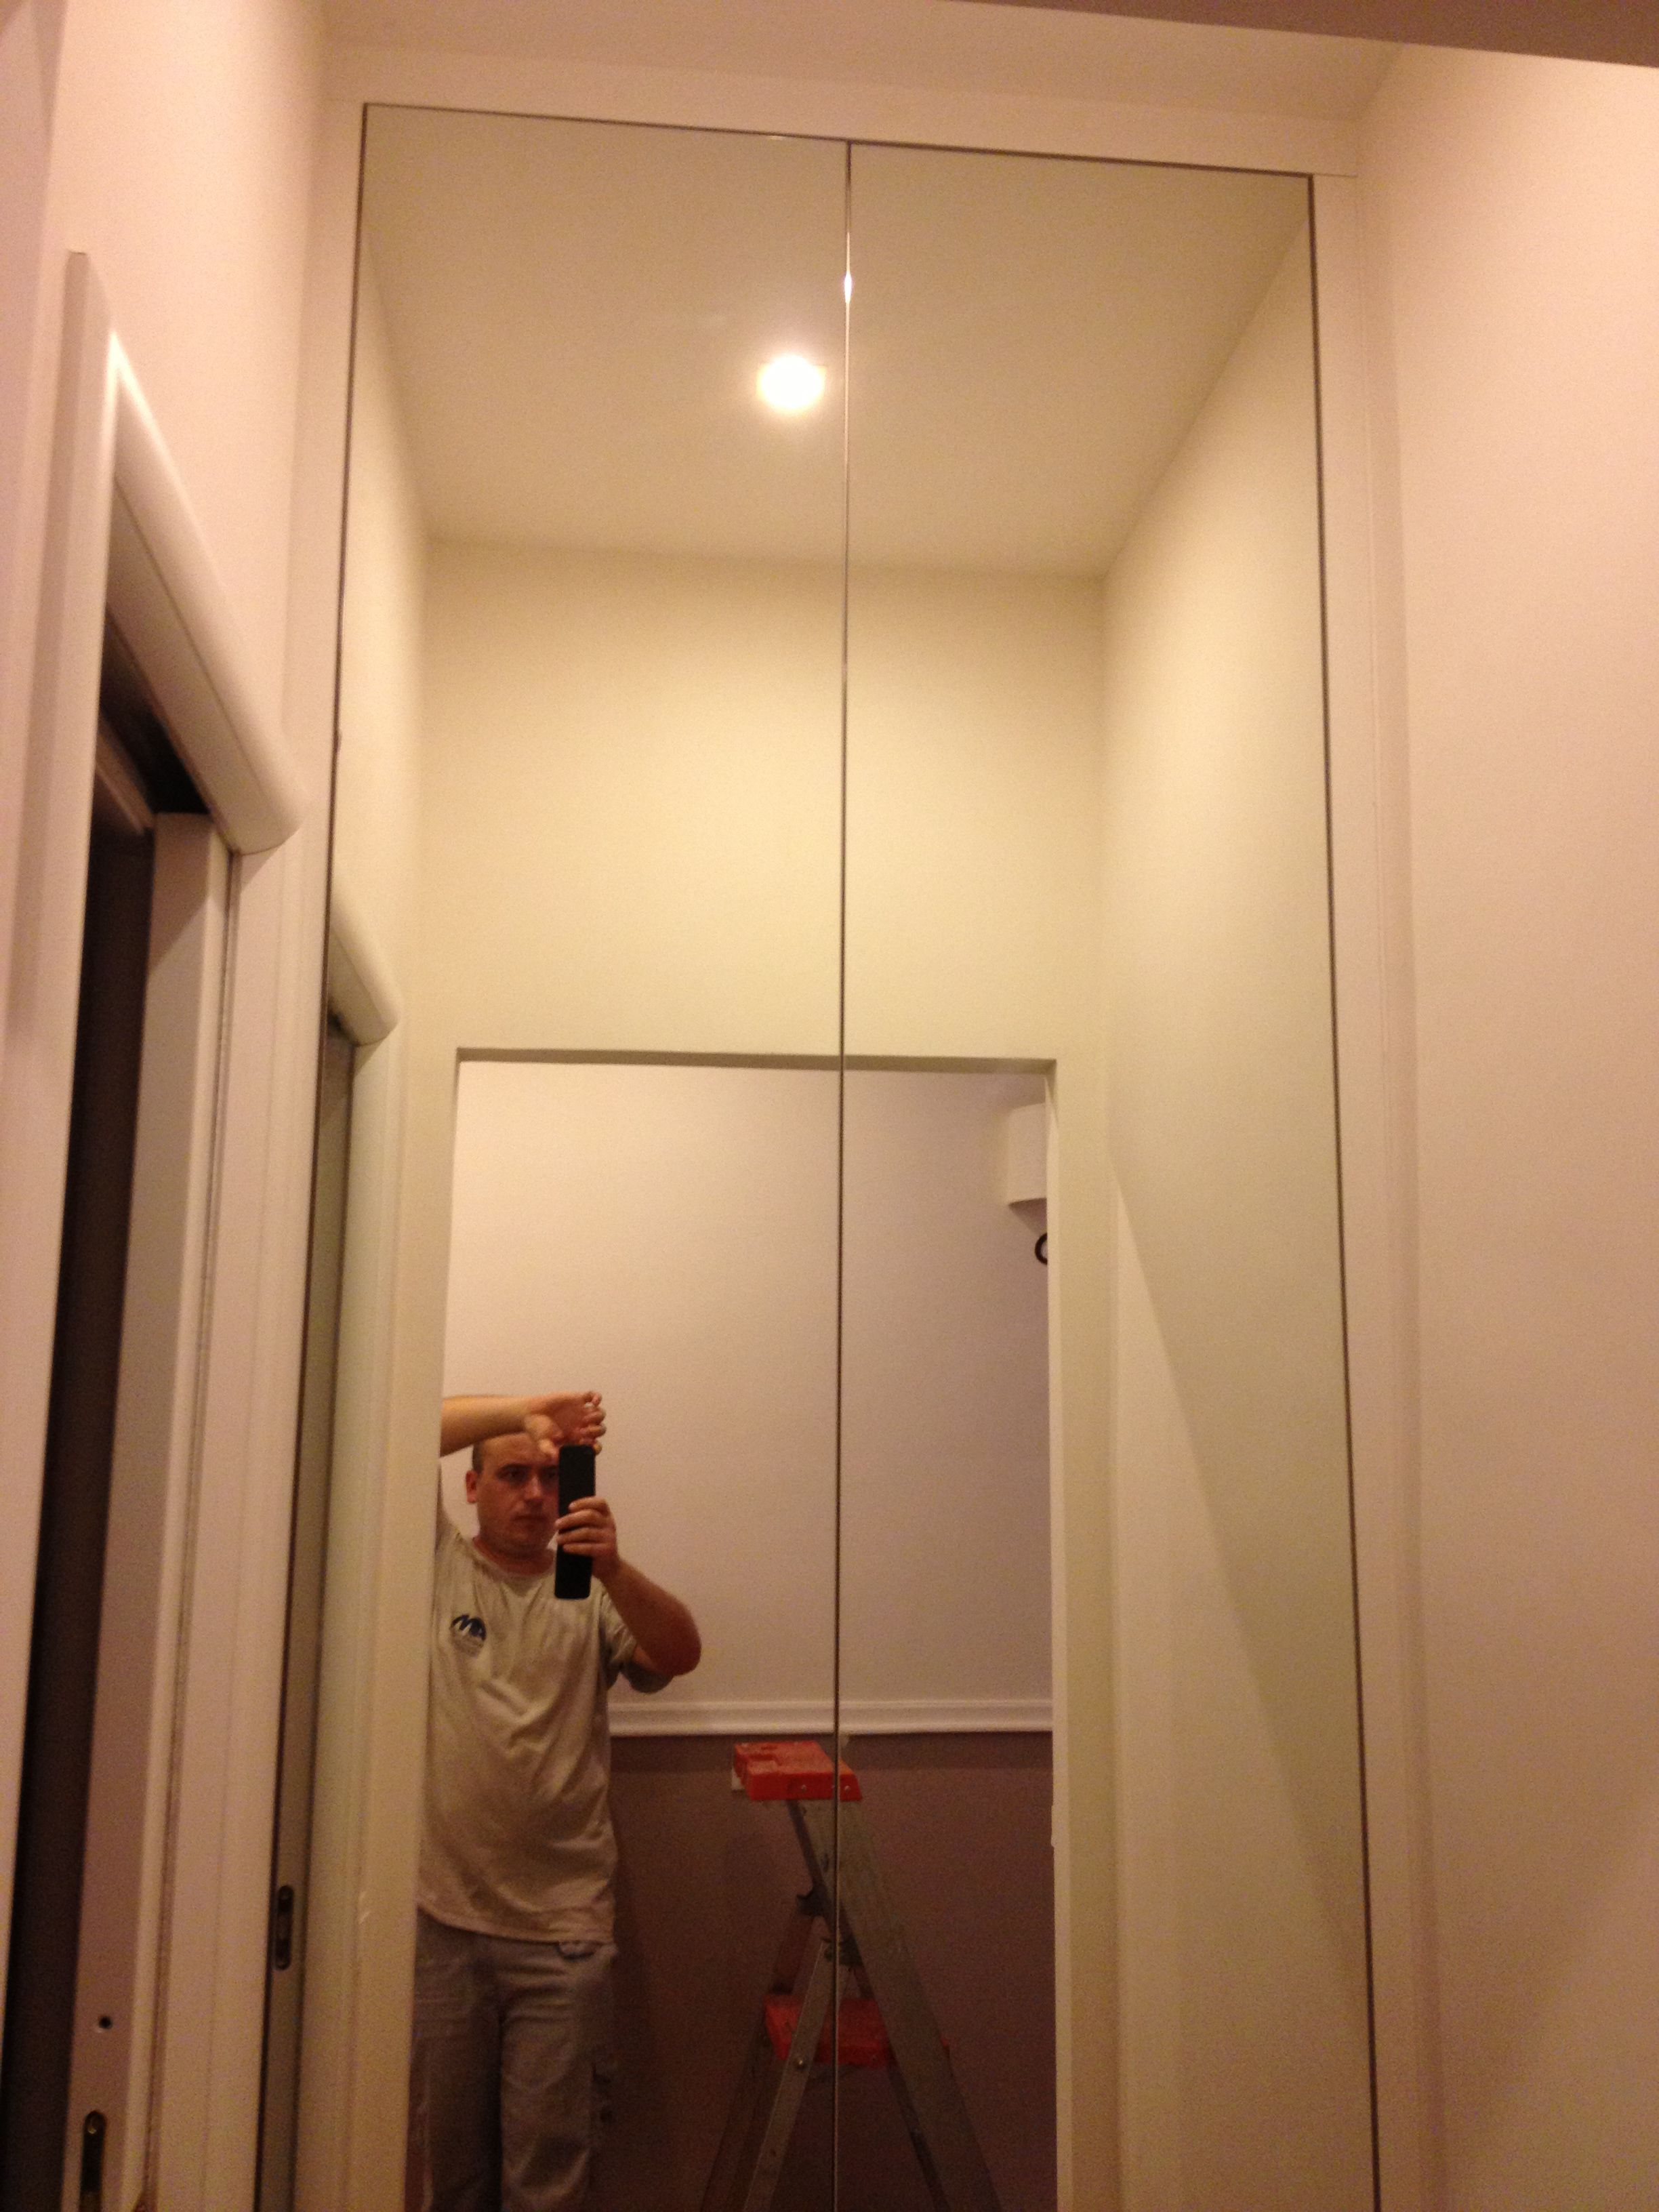 Ante Per Armadio A Muro Specchio.Armadio A Muro Con Specchi Jpg 2448 3264 Armadio A Muro Armadio Specchio Armadio